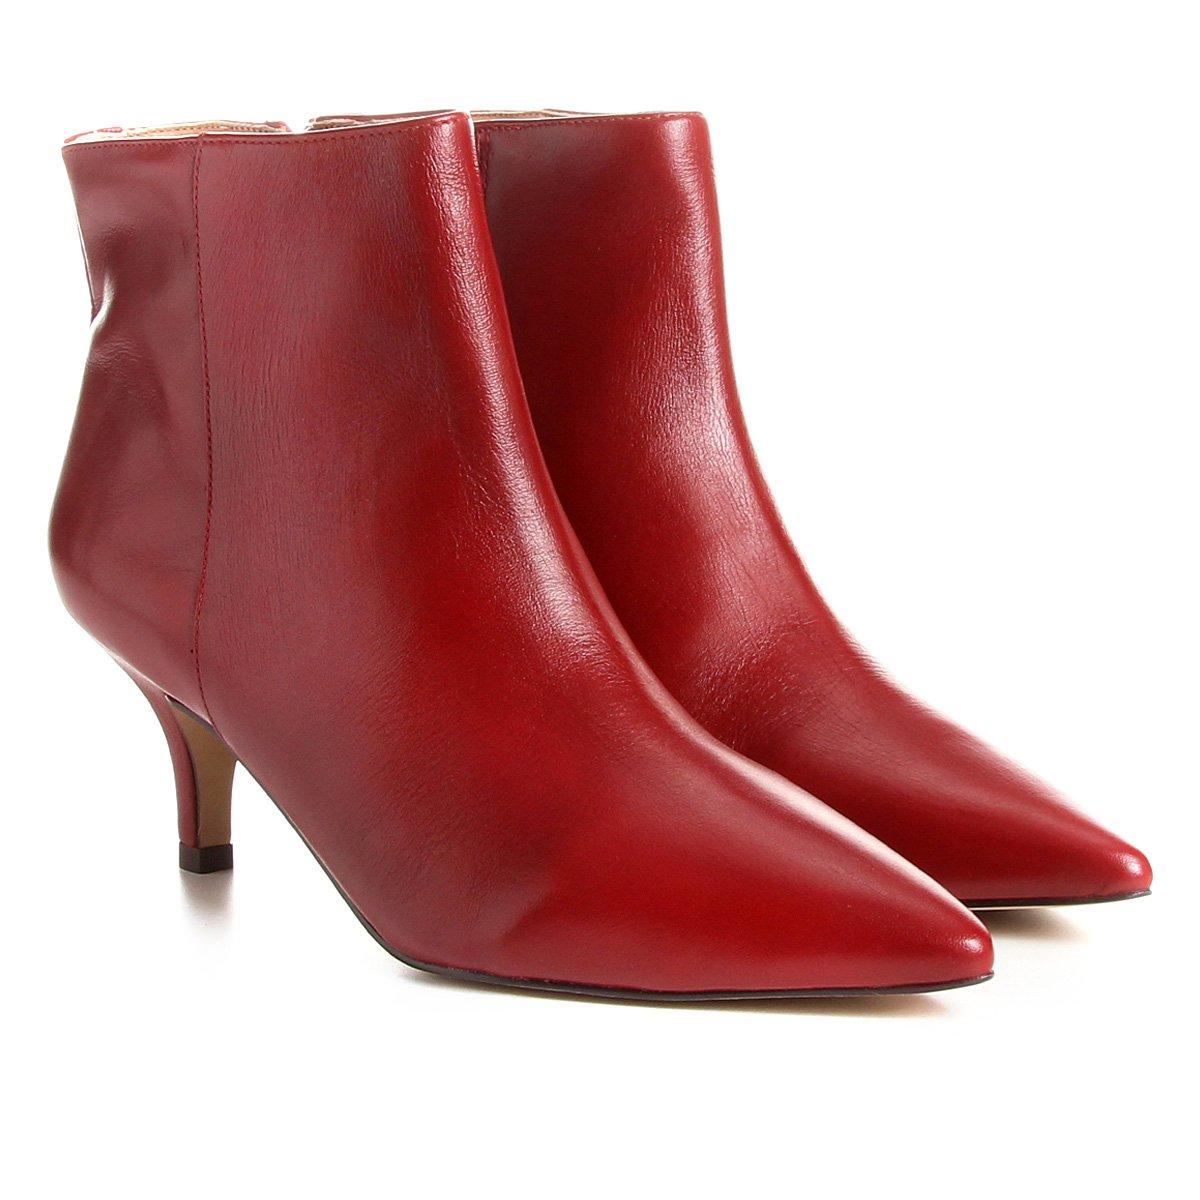 1ad4e1c84 ... Bota Couro Cano Curto Shoestock Salto Curto Feminina